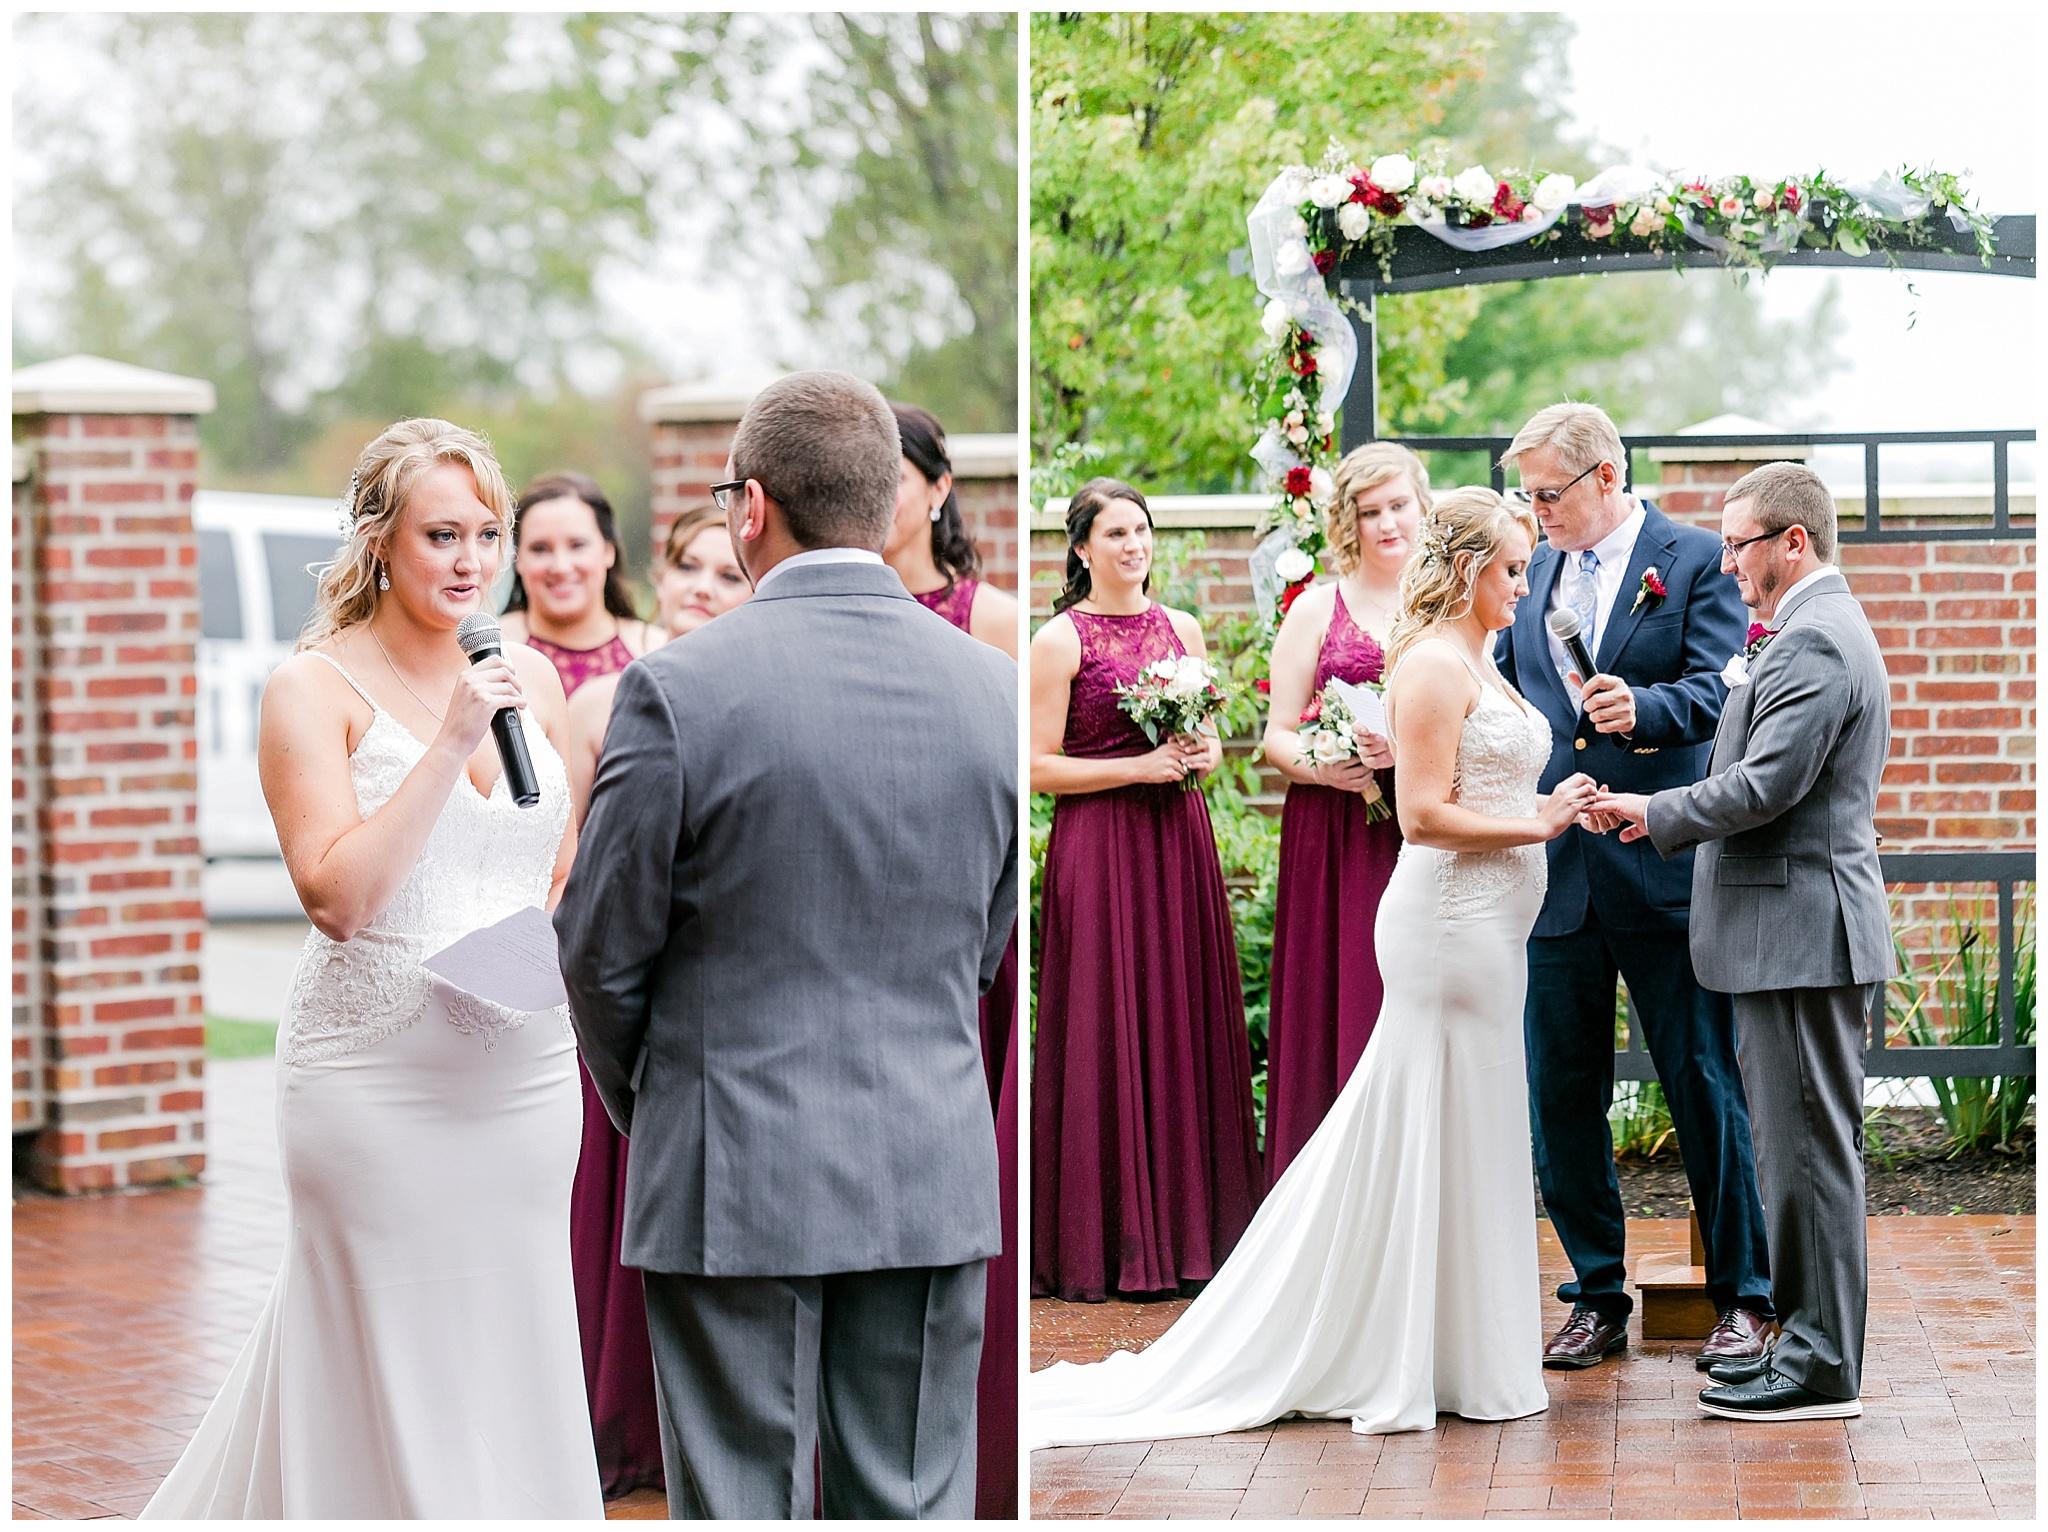 noahs_event_venue_sun_pairie_madison_wisconsin_wedding_photographers_0290.jpg